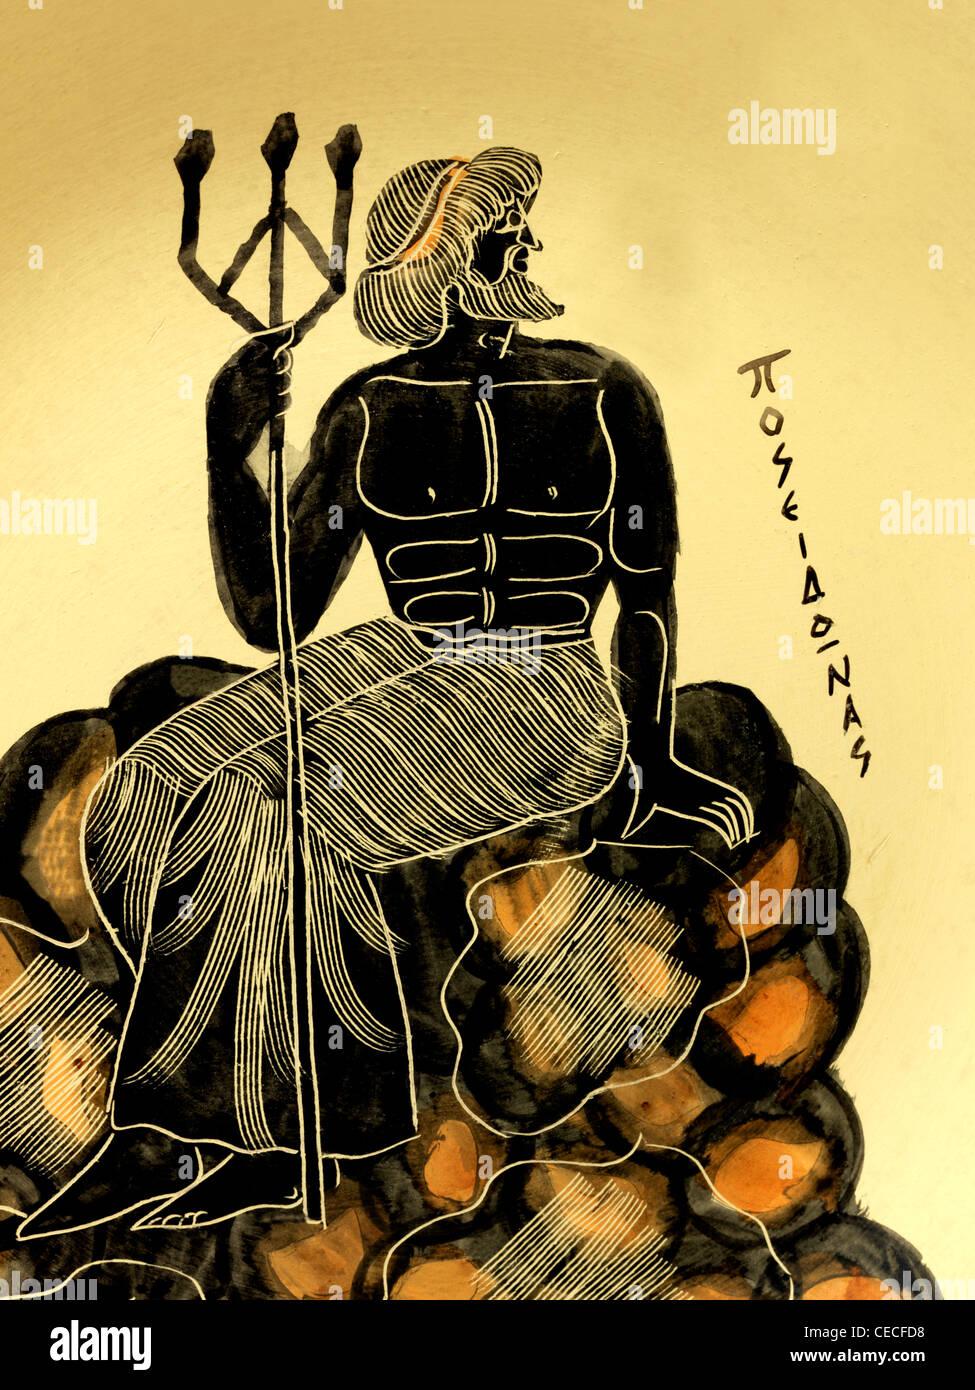 greek plate depicting poseidon sitting on rocks holding a trident